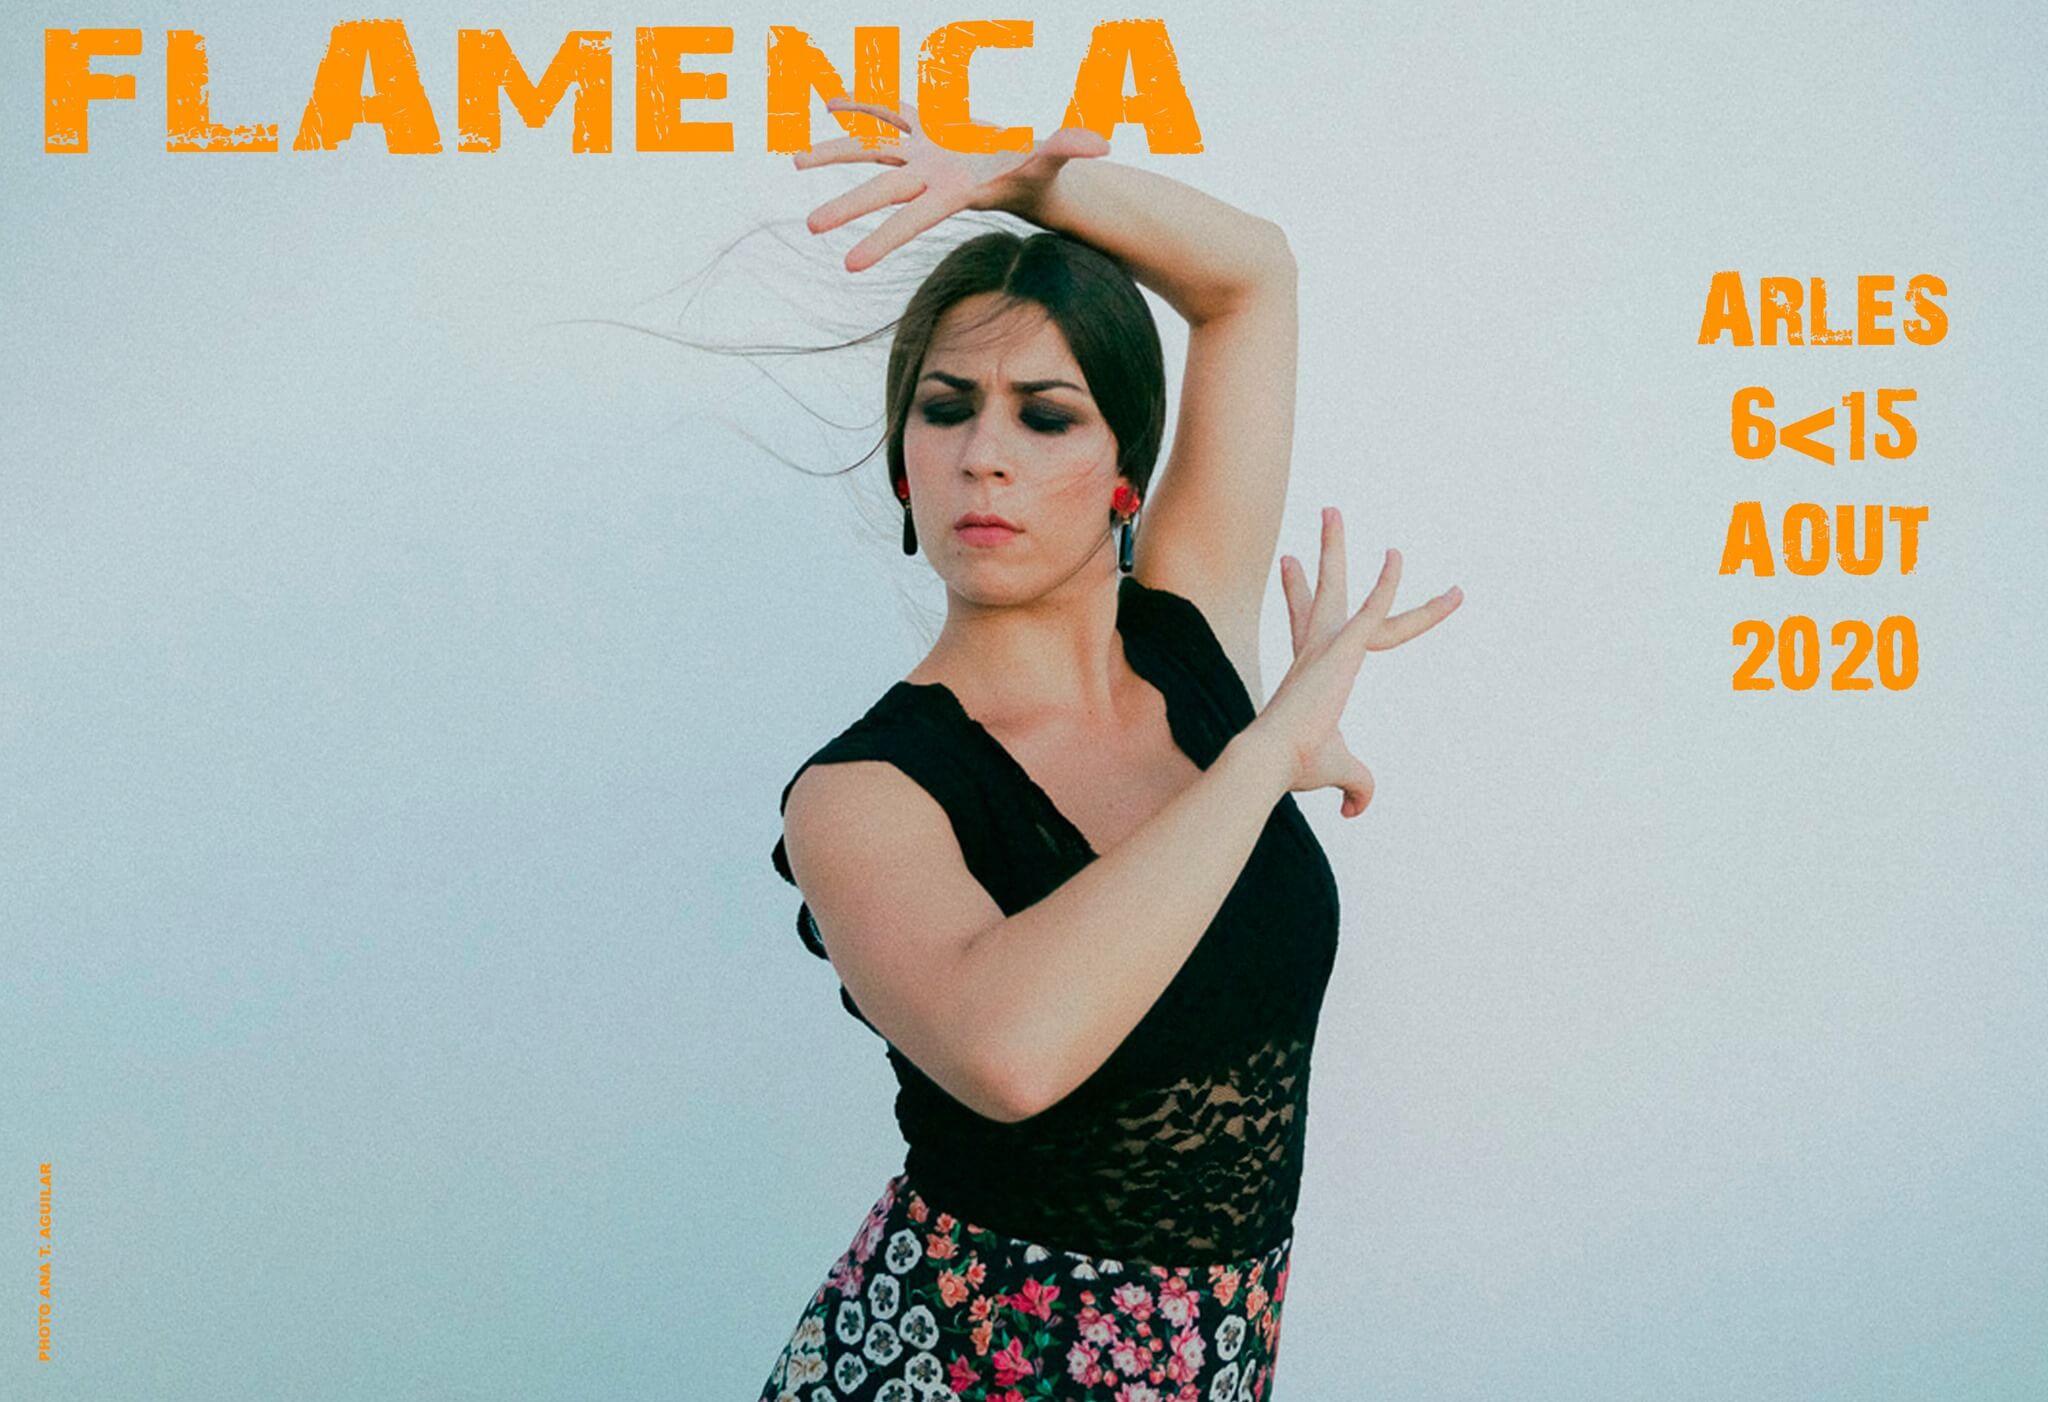 festival flamenca arles 2020